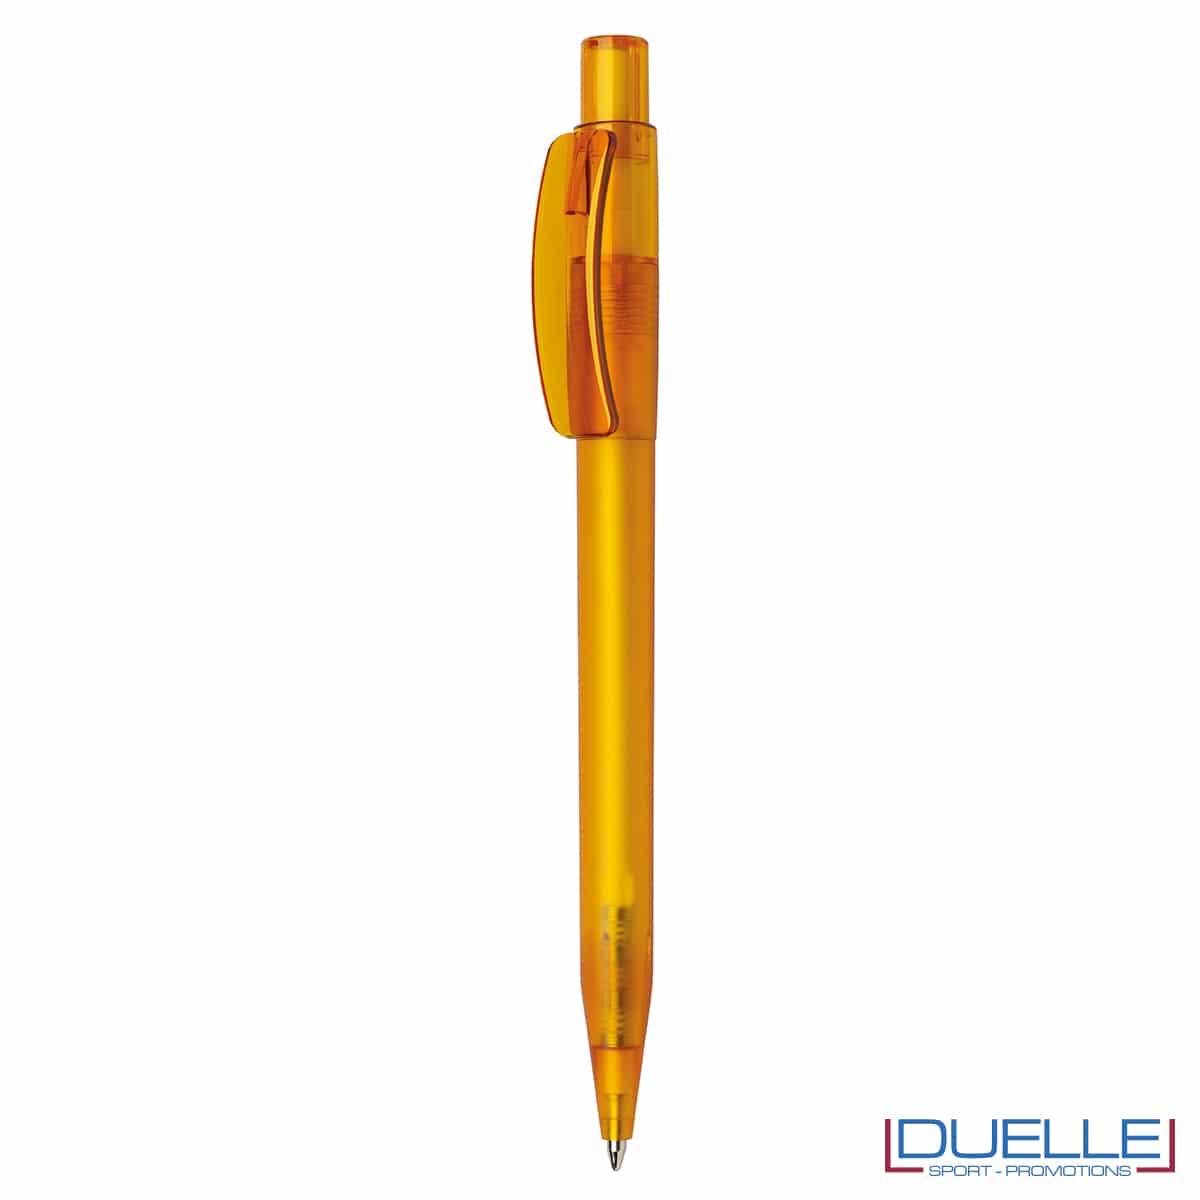 Penna ambra effetto trasparente